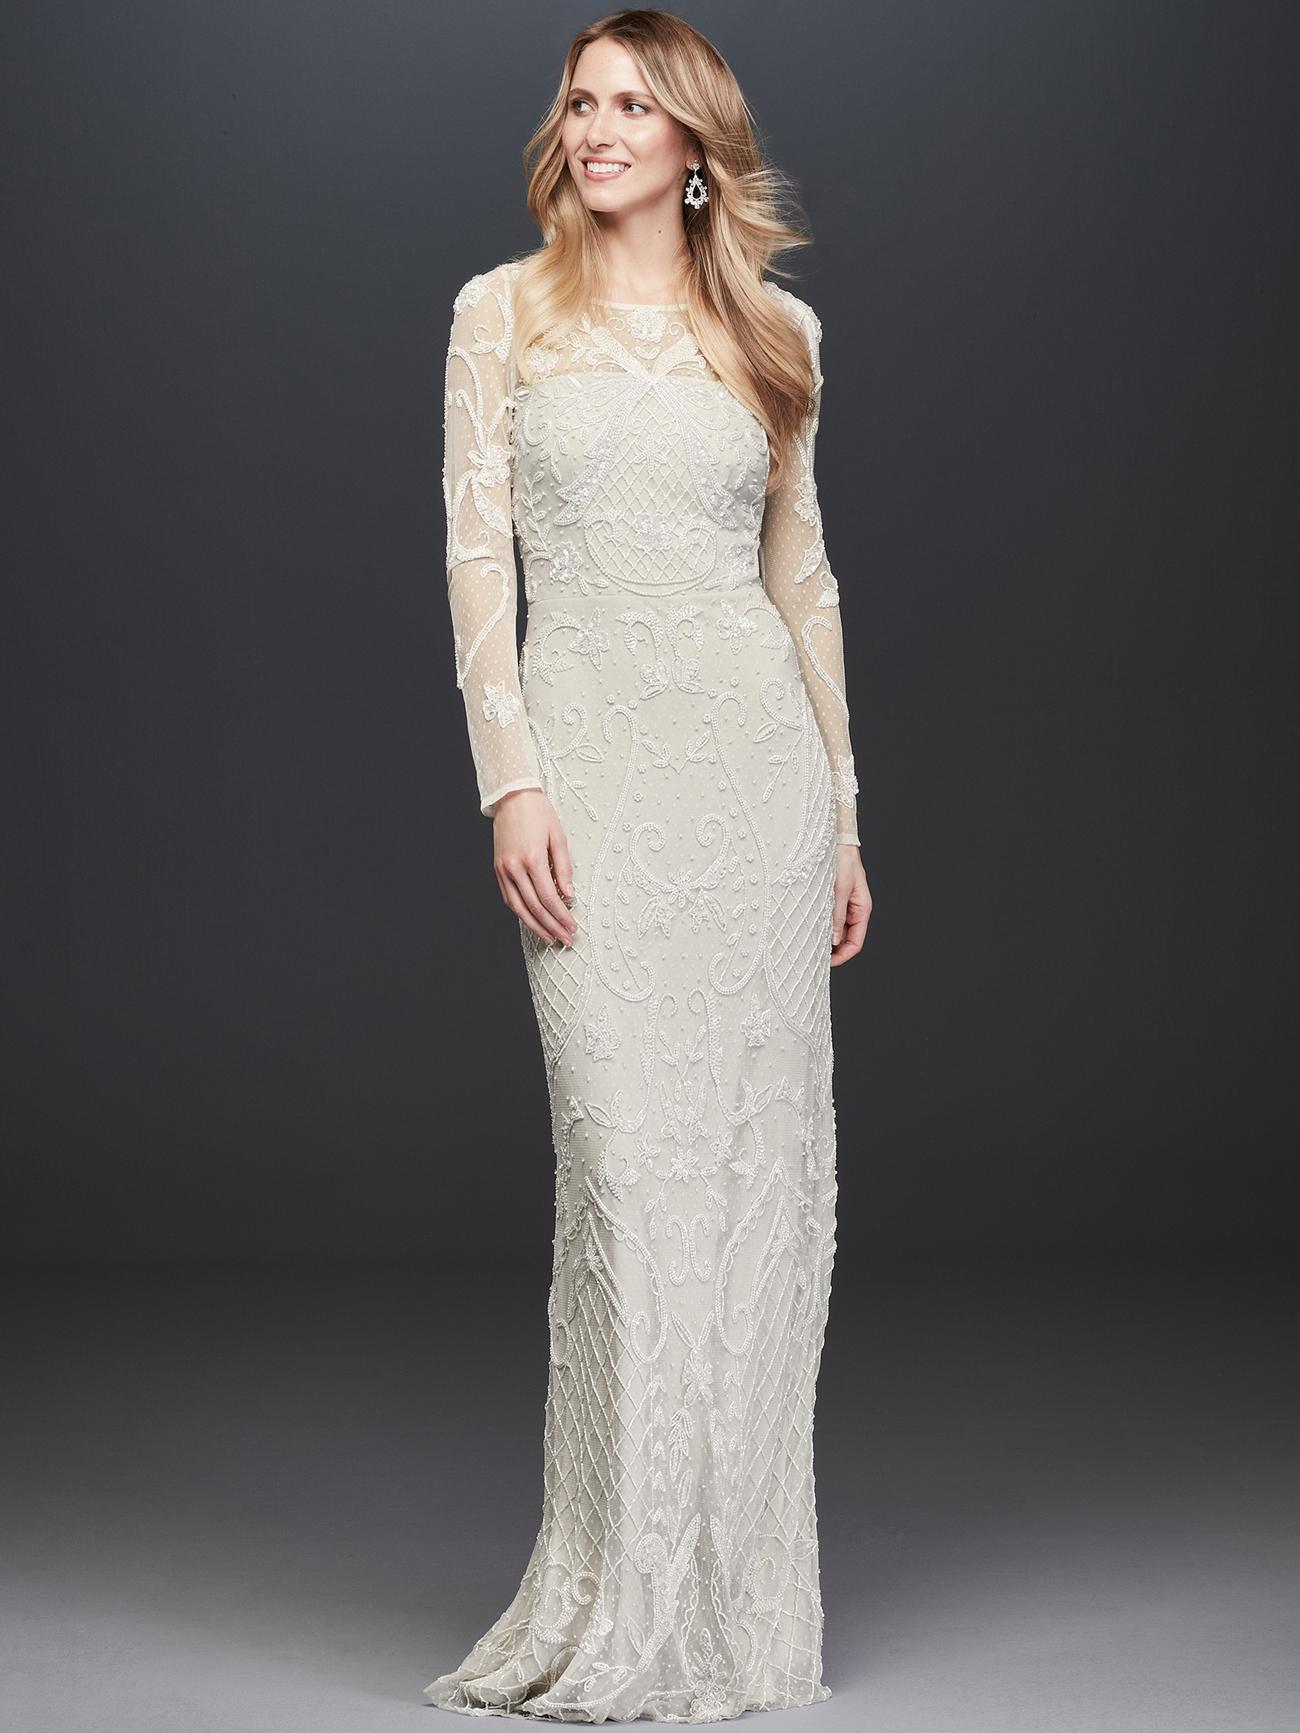 davids bridal db studio sheer lace long sleeve wedding dress fall 2020